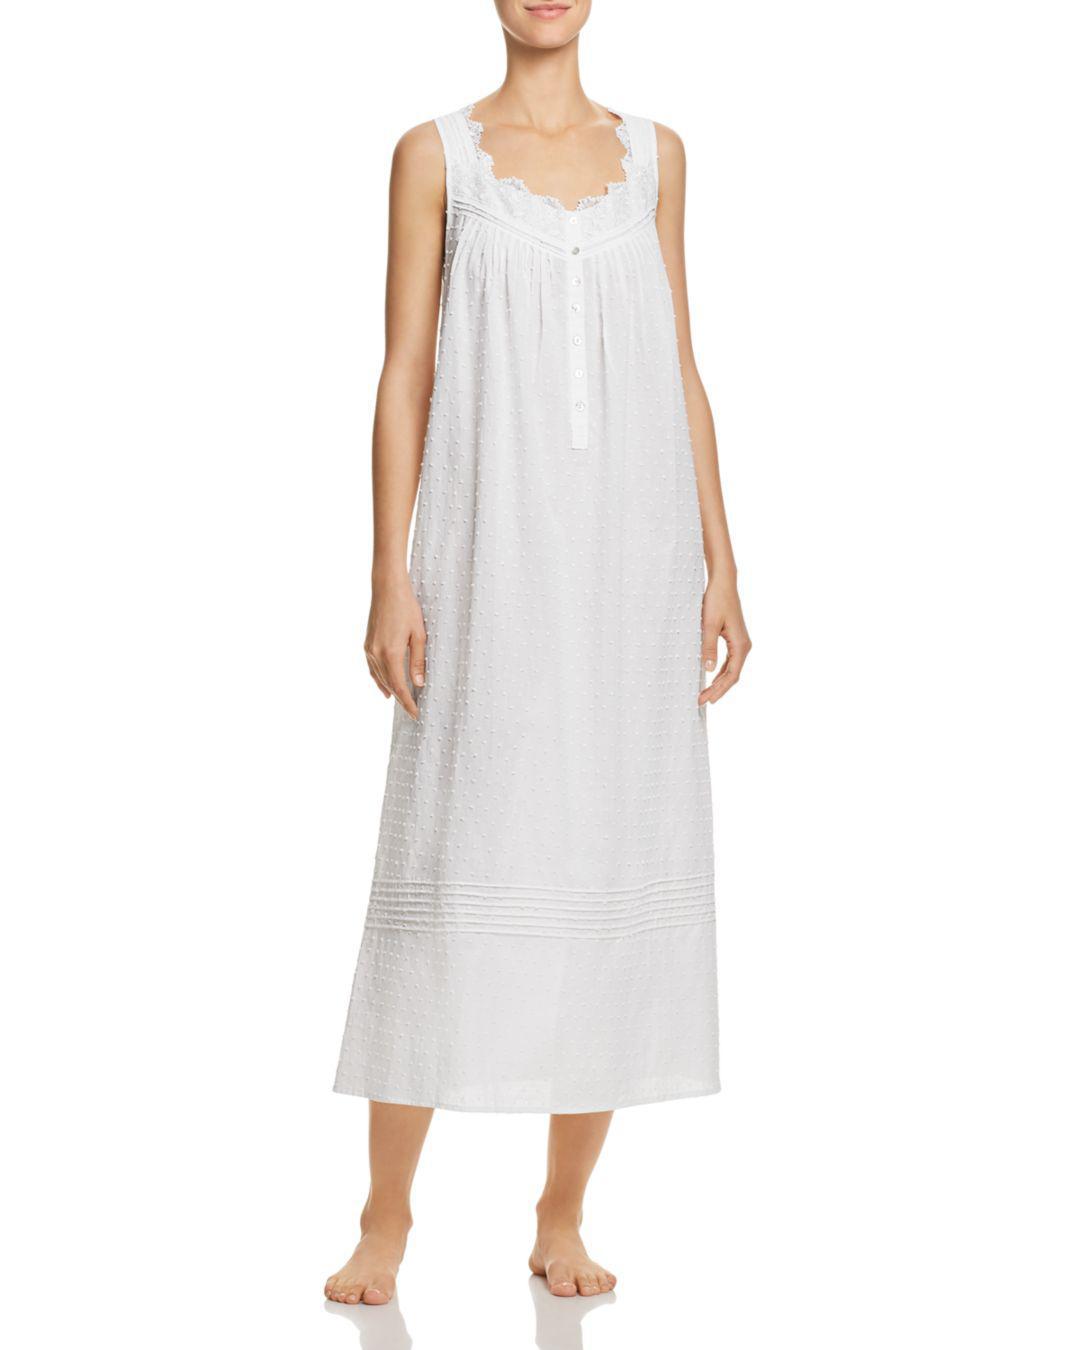 7512a5b36f Eileen West Ballet Long Gown in White - Lyst